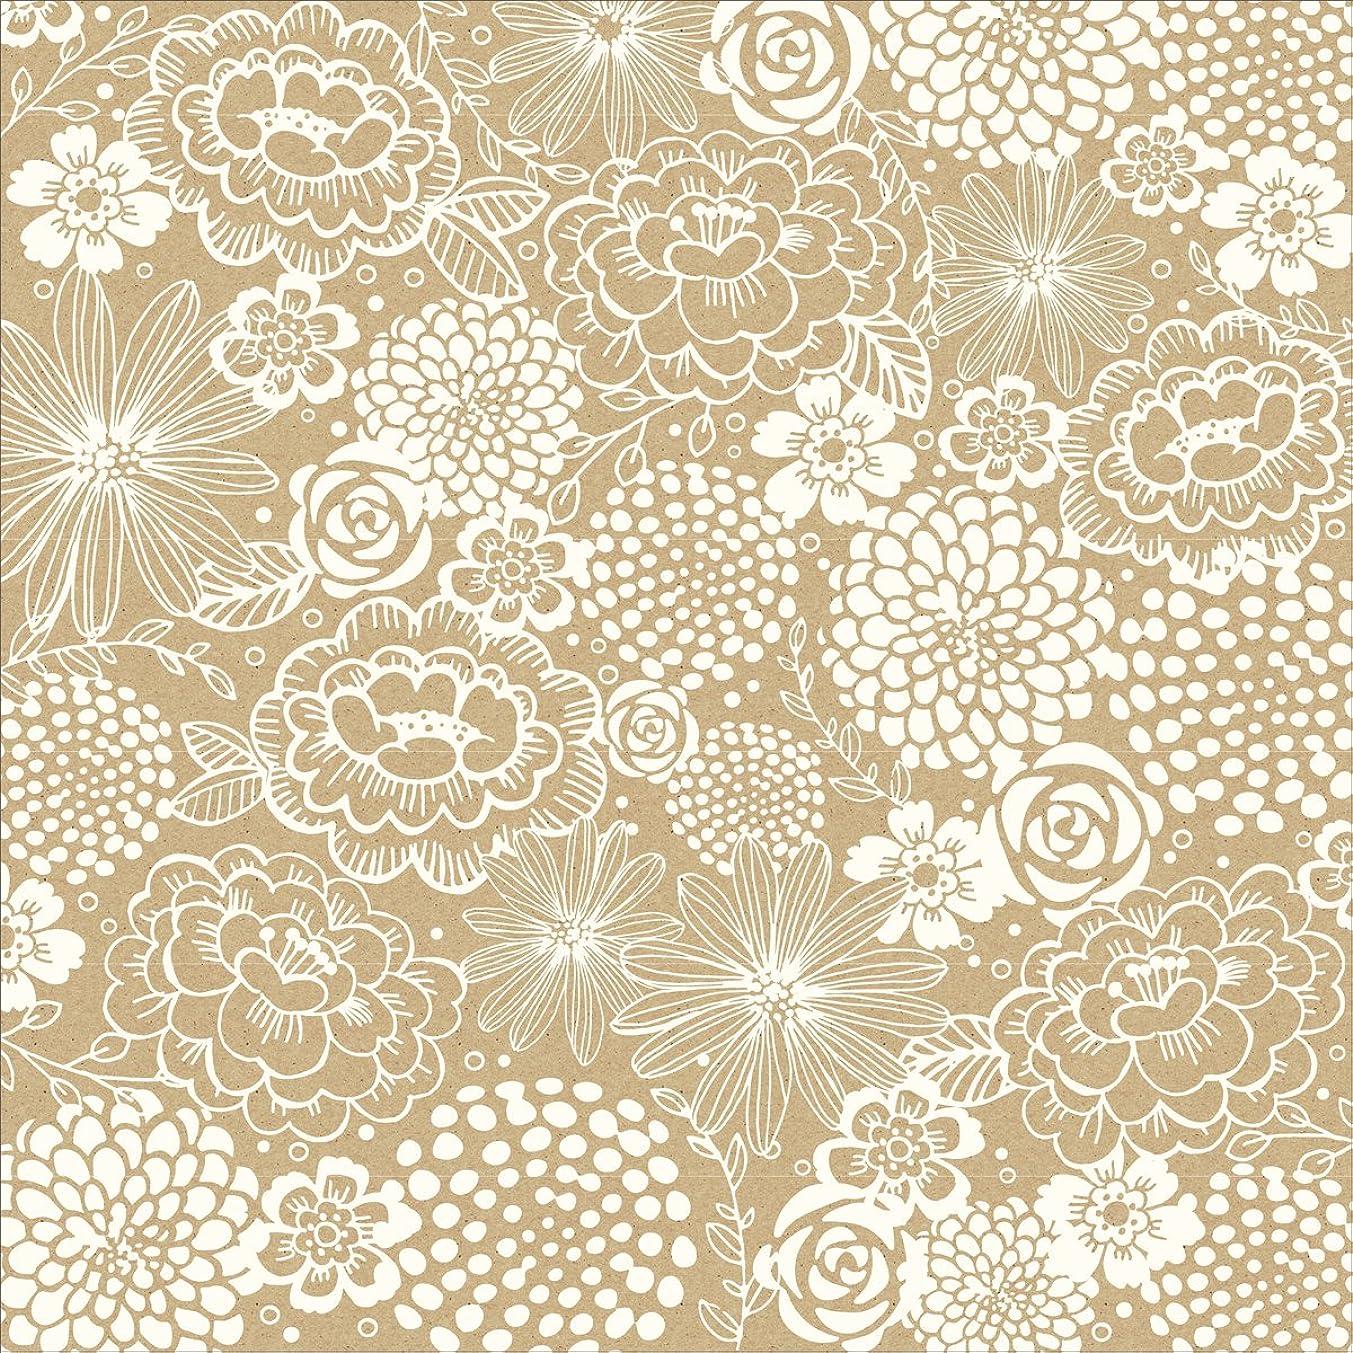 American Crafts Homemade Floral Kraft Cardstock, 12